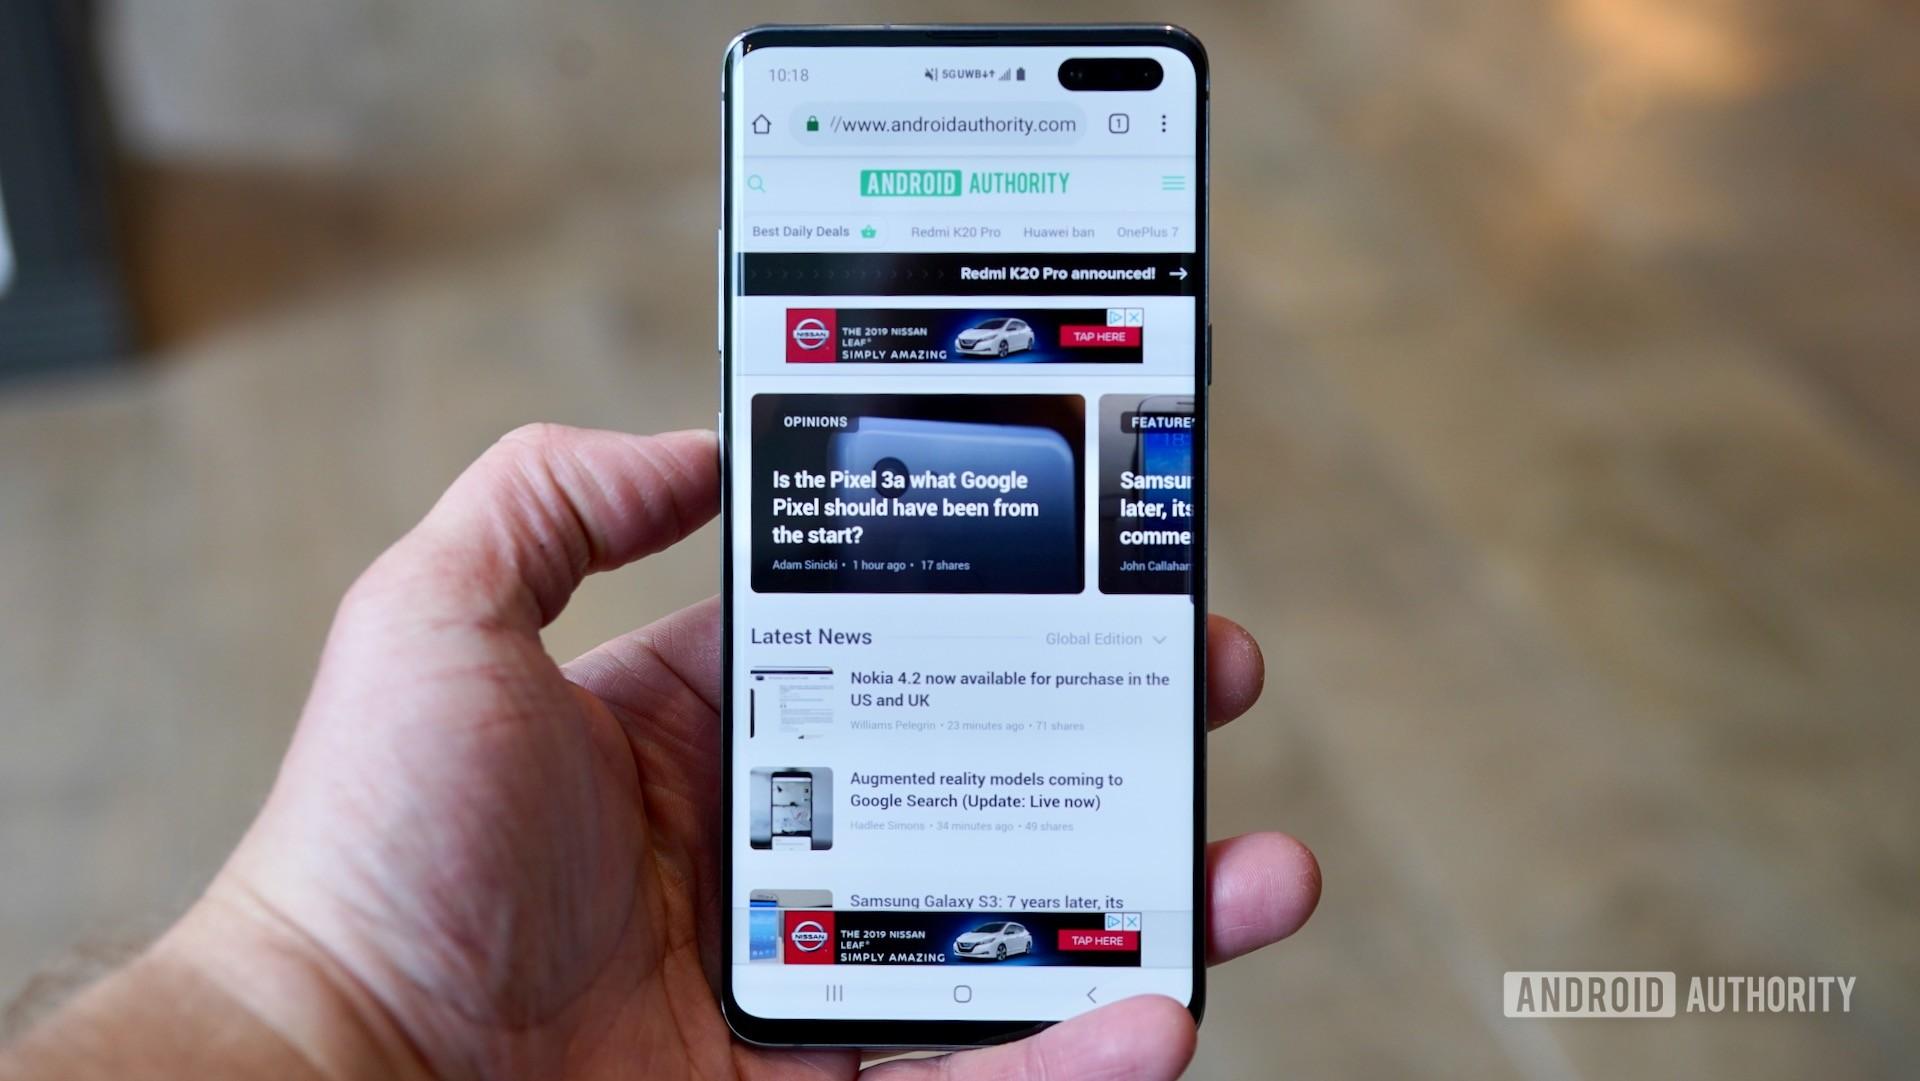 Samsung Galaxy S10 5G Verizon Wireless Android Authority